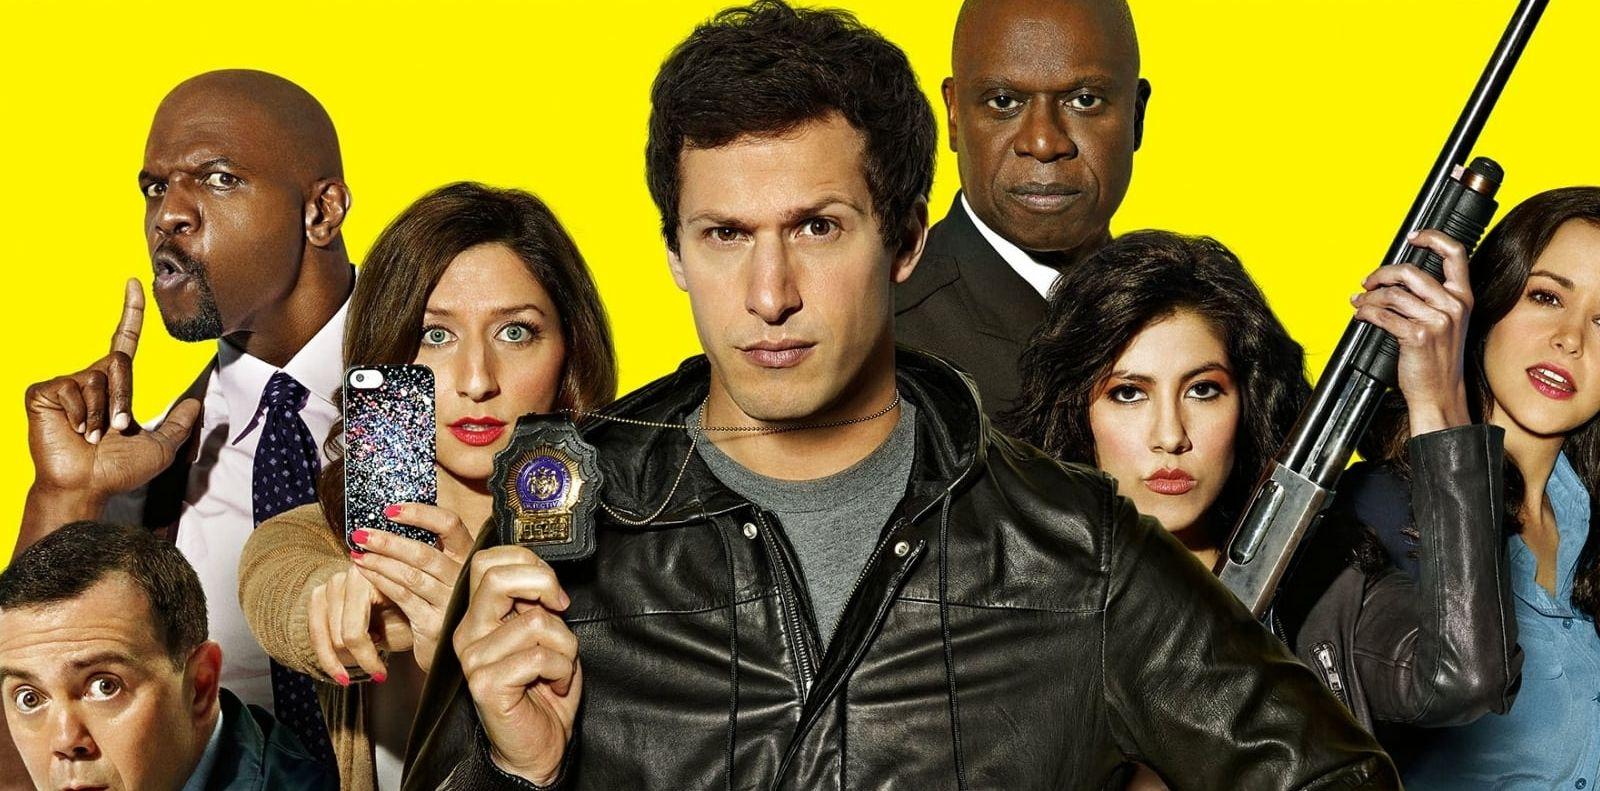 Brooklyn Nine-Nine : Peralta rend les armes, la saison 8 sera la dernière - ÉcranLarge.com